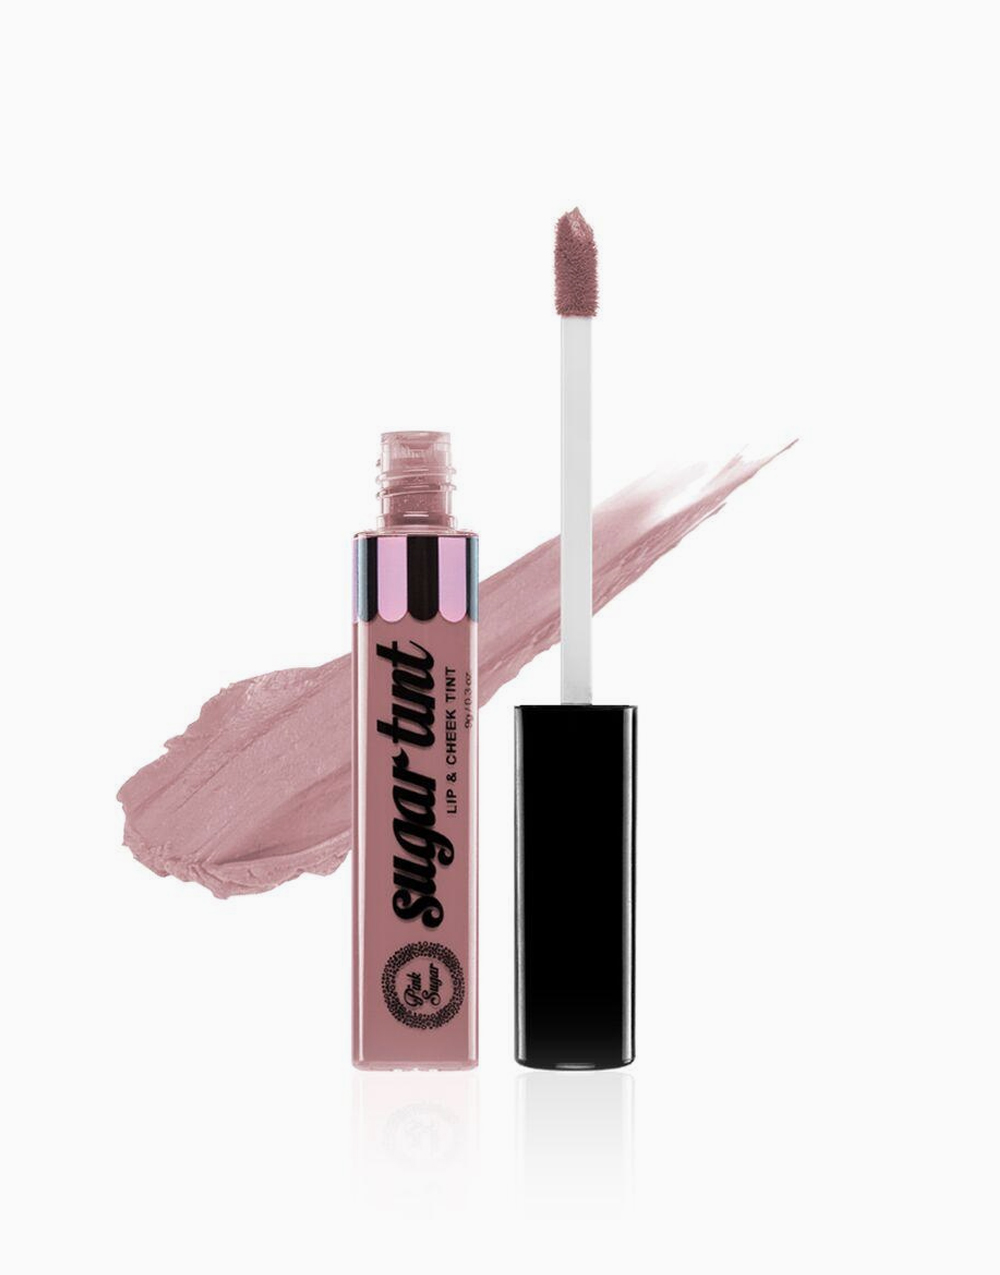 Sugar Tint Lip & Cheek Tint by Pink Sugar | -, Unforgettable